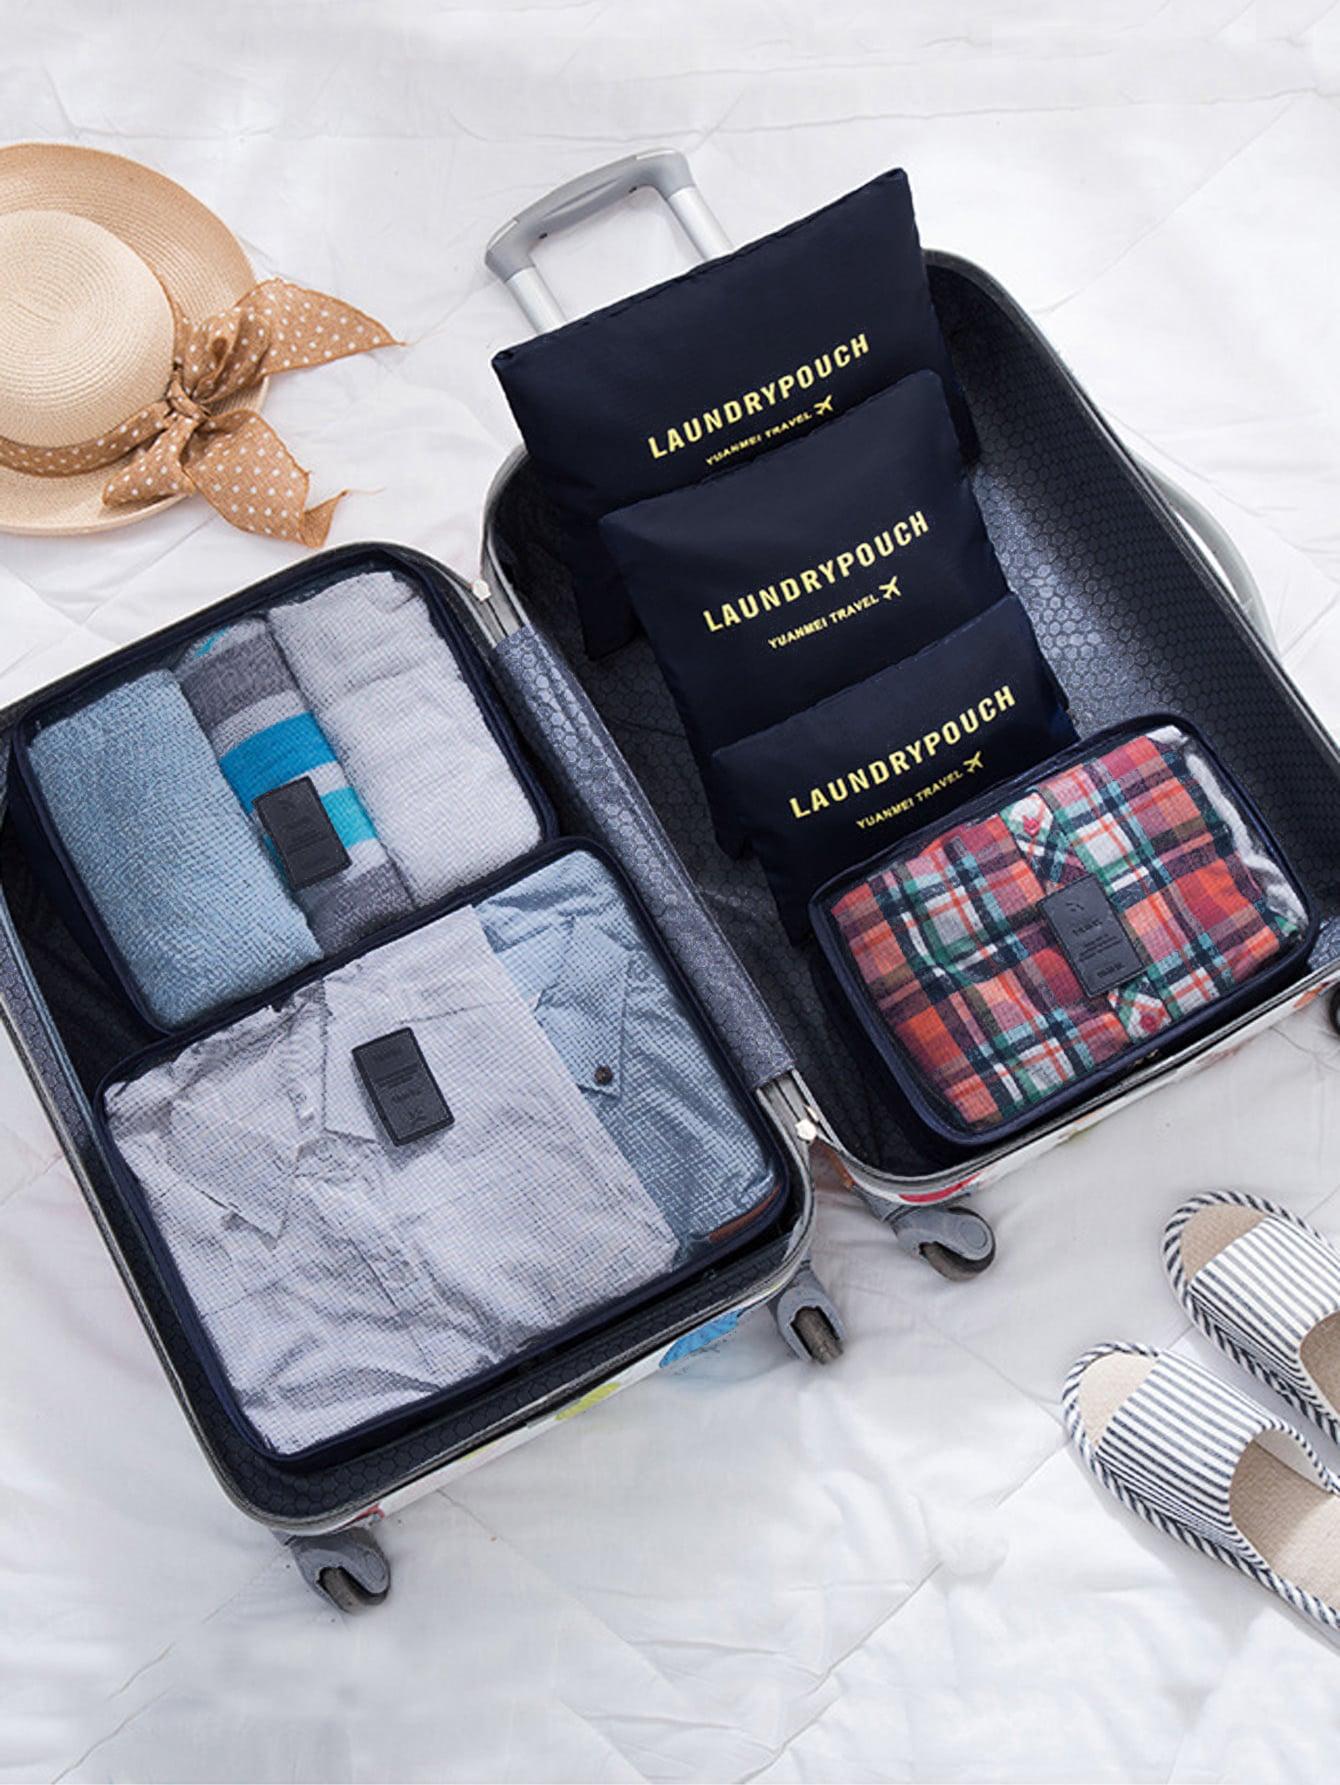 6 Pcs Travel Bags Set Minimalist Storage Bag